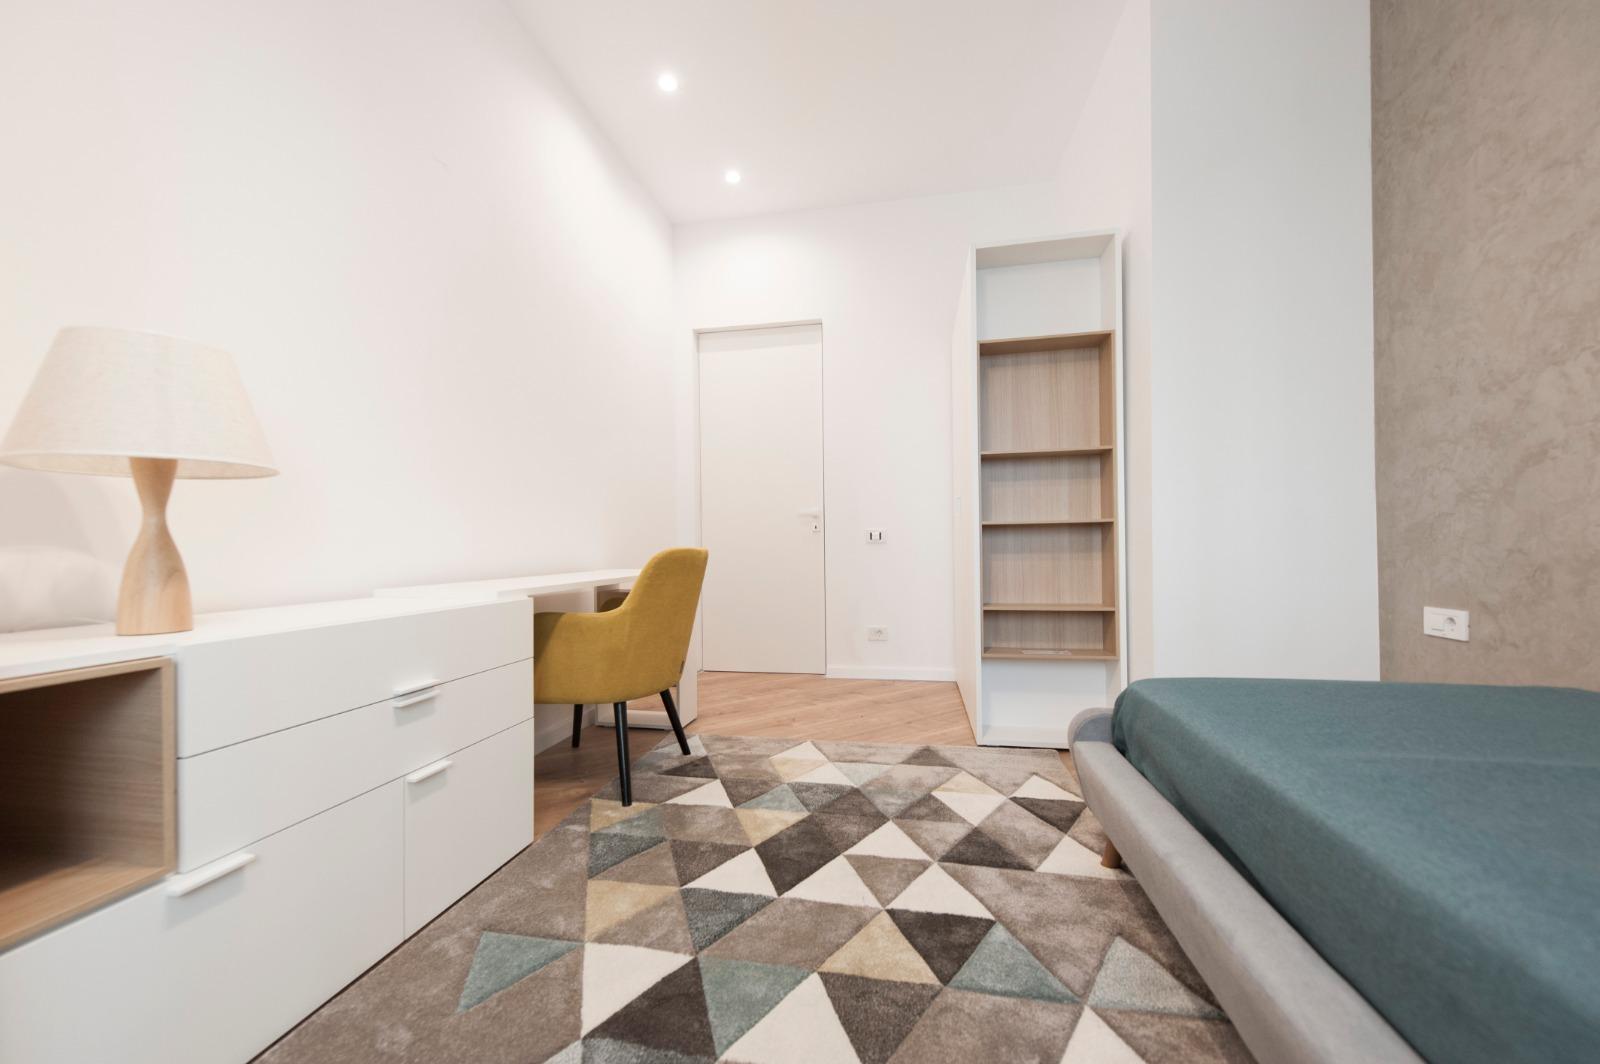 Pipera, Plazza, Apartament cu 3 camere moblat, loc parcare